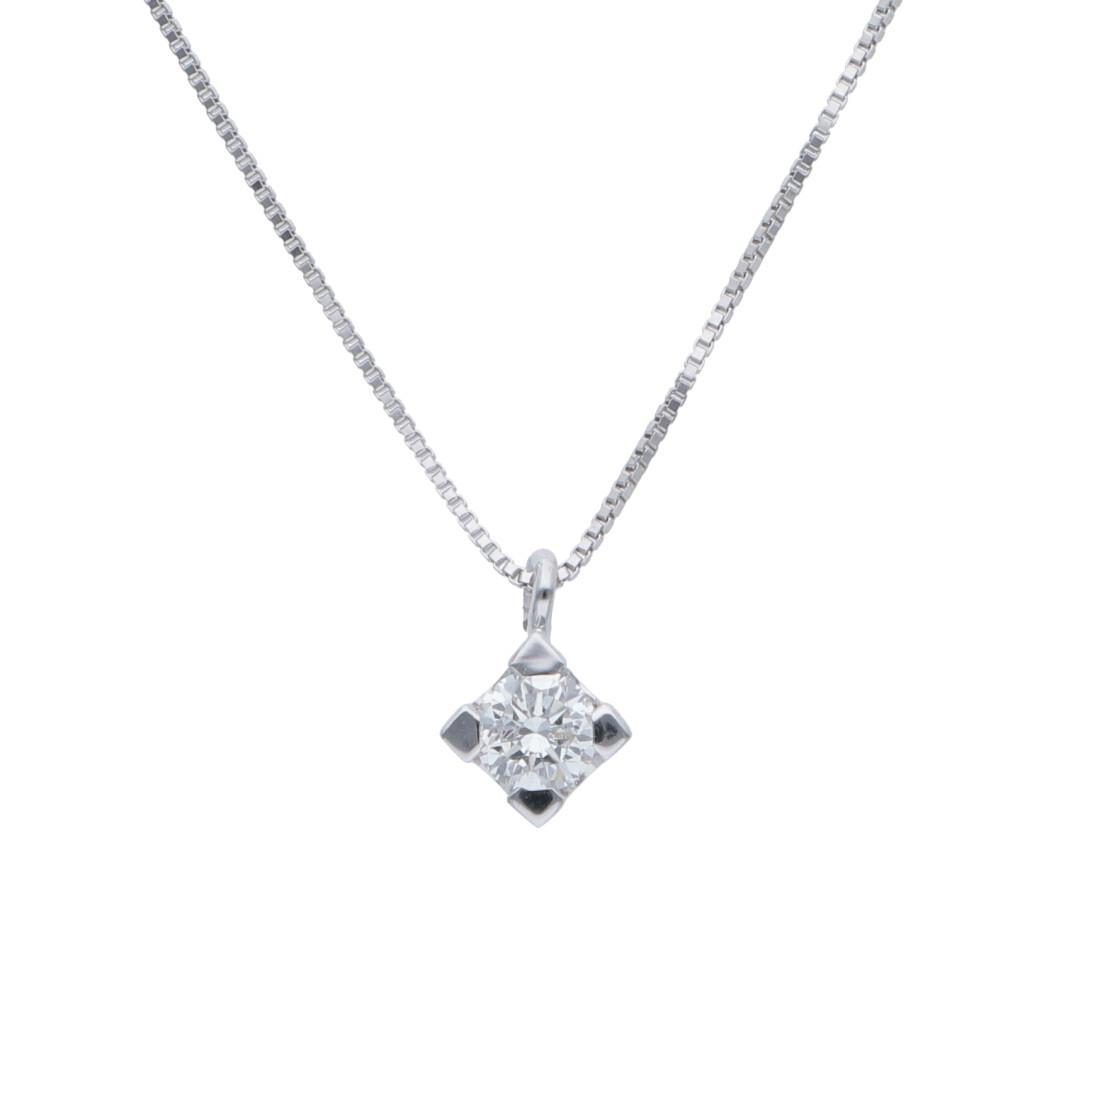 Point of light necklace ct. 0.23 - ALFIERI & ST. JOHN